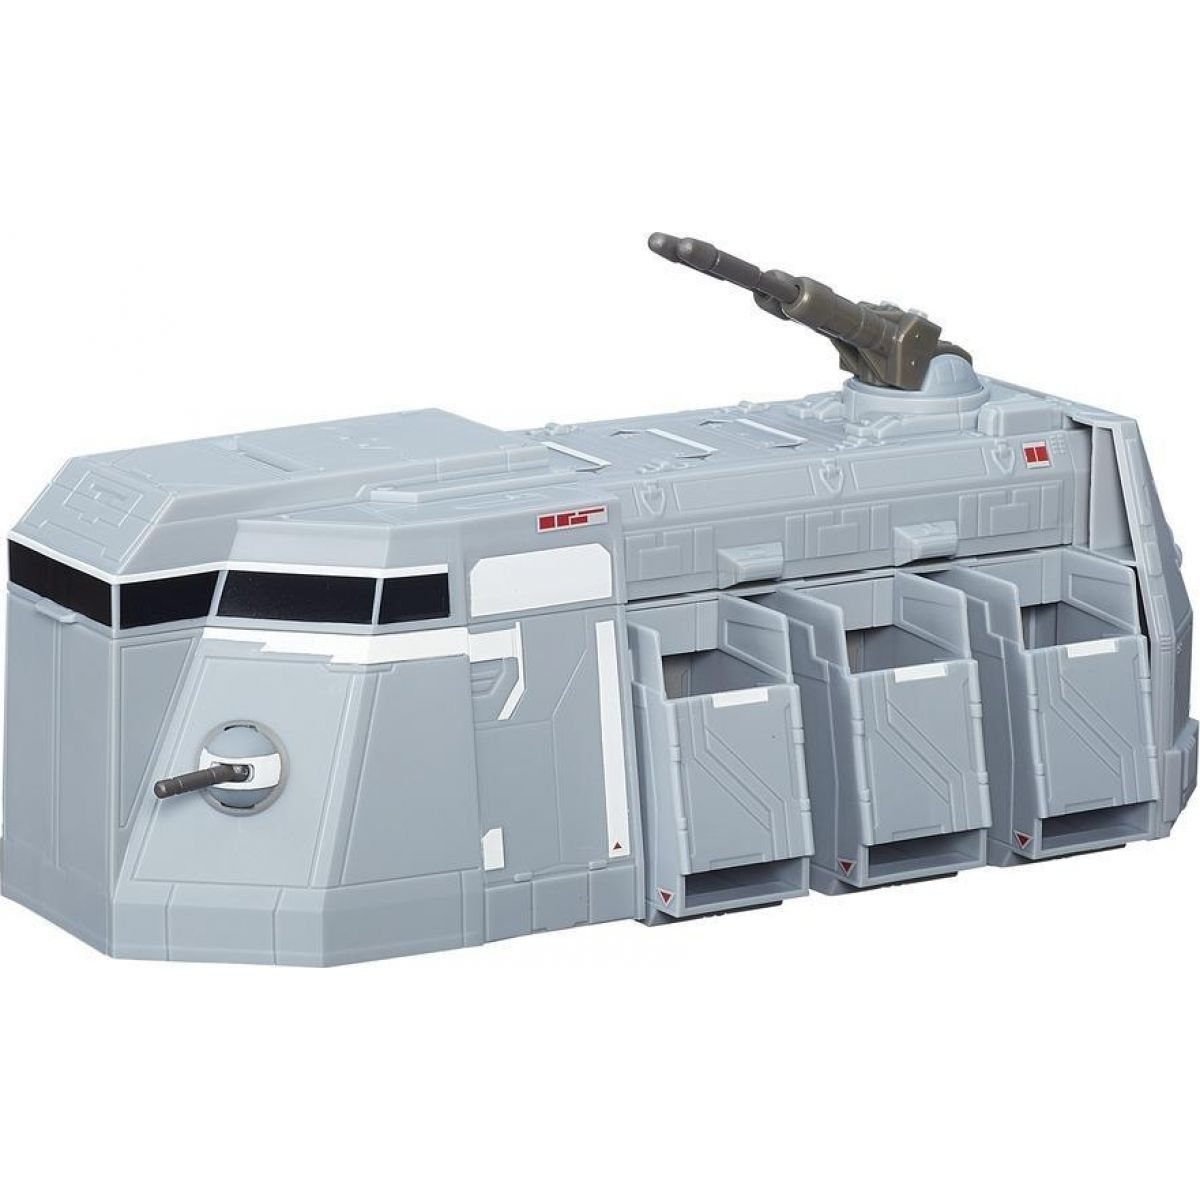 Star Wars Vesmírná vozidla II Hasbro A2174 - Imperial Troop Transport